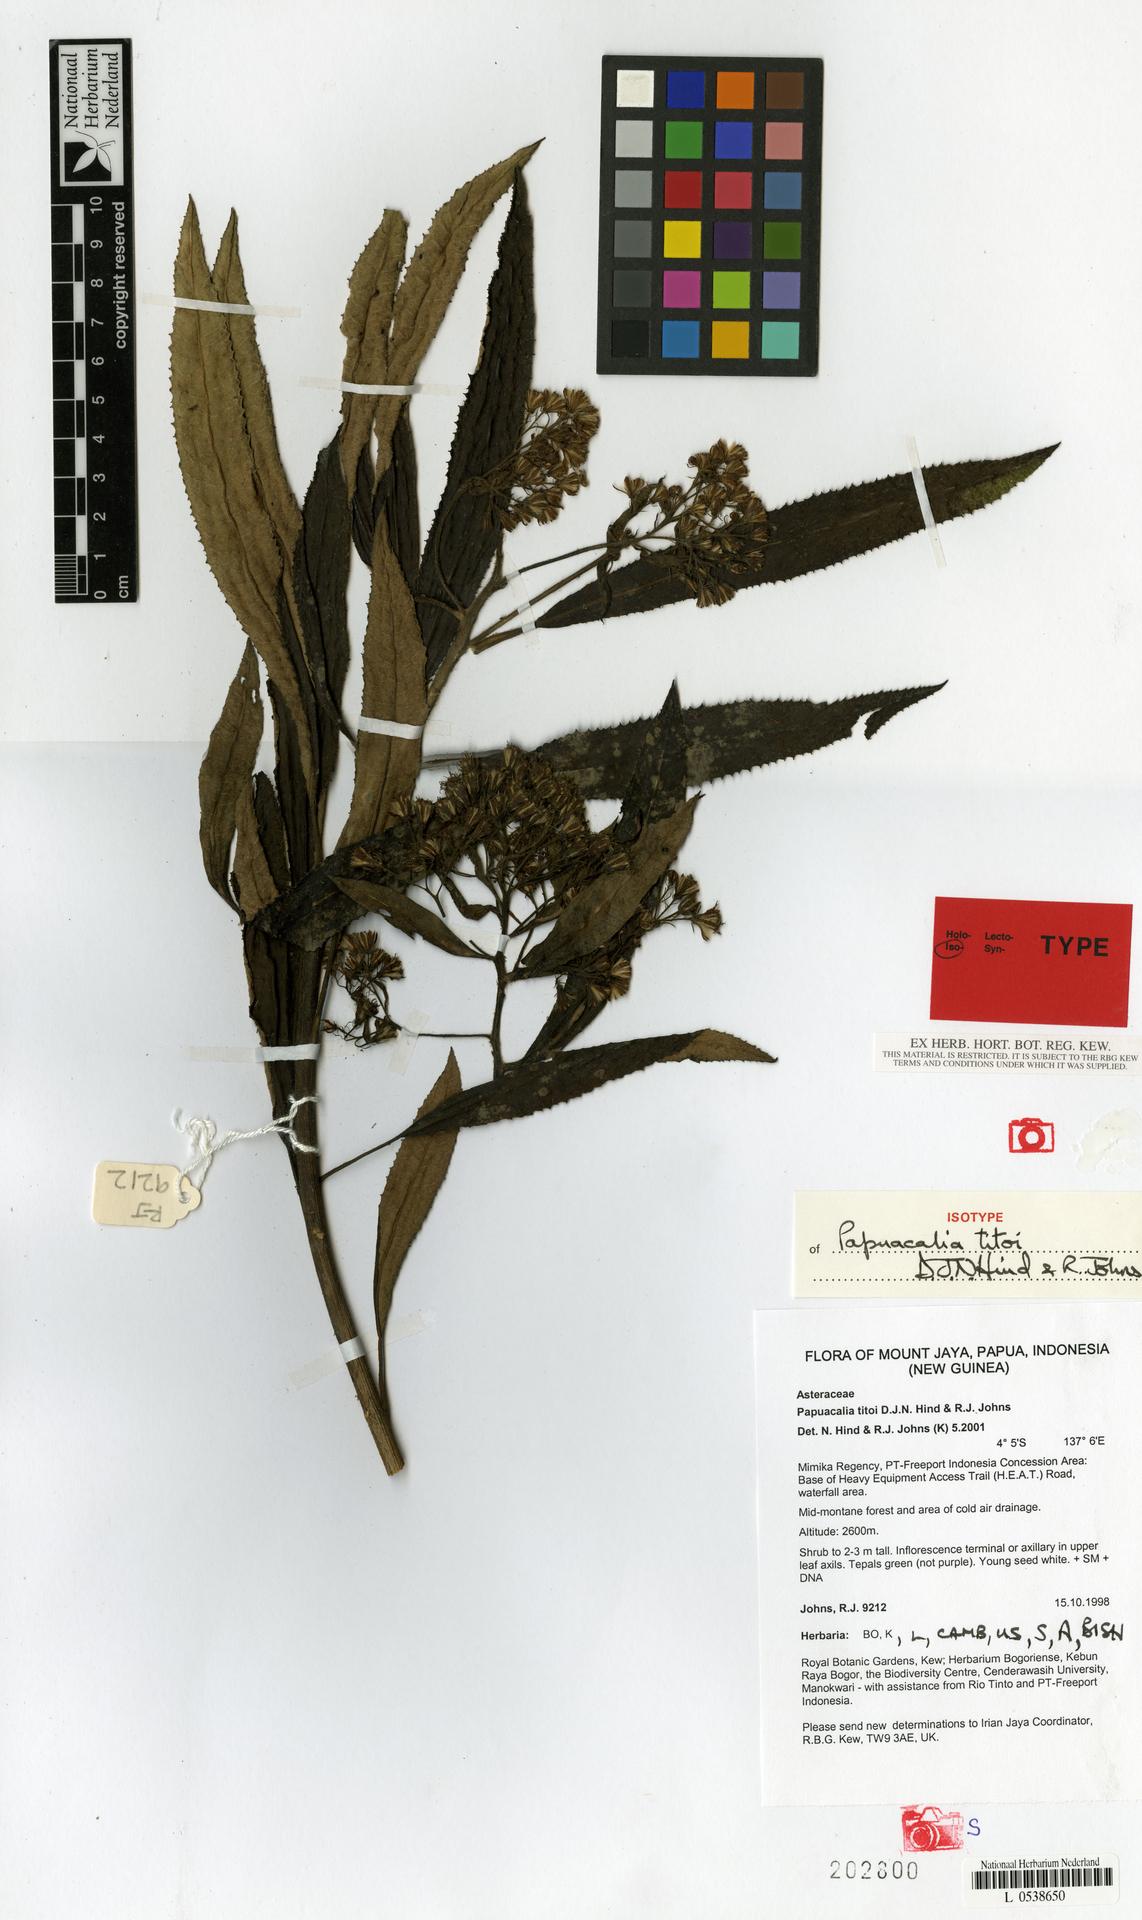 L  0538650 | Papuacalia titoi D.J.N.Hind & R.J.Johns